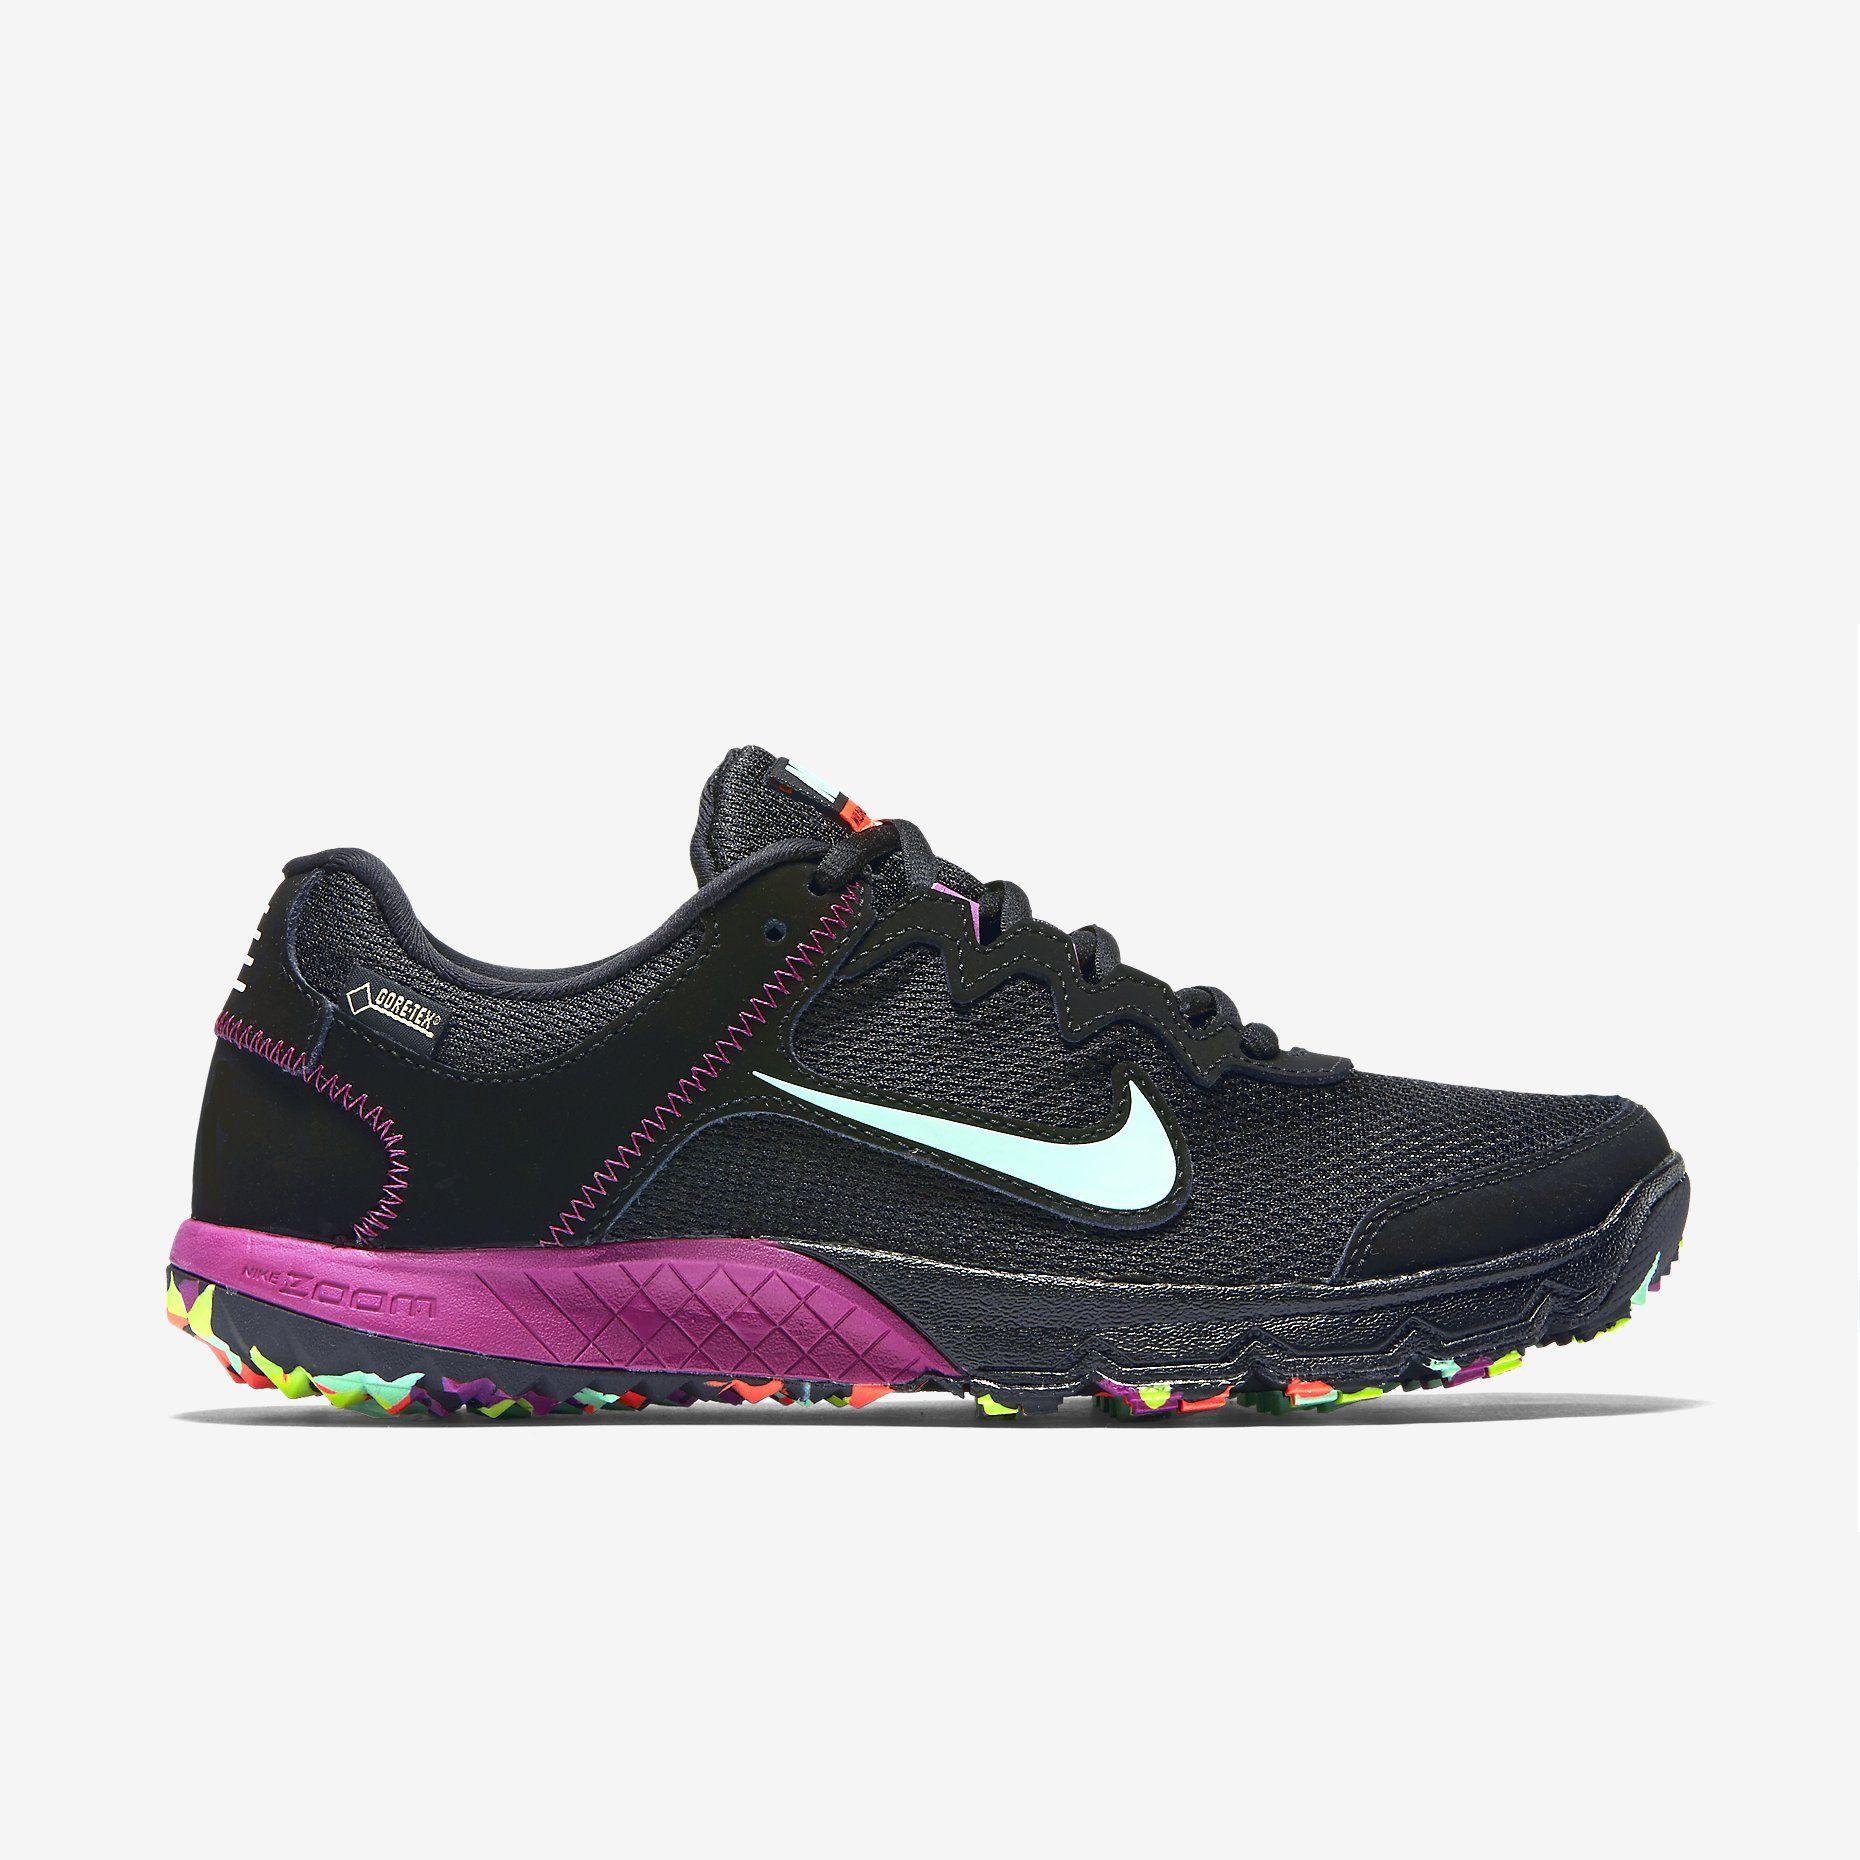 Mancha Filosófico tengo sueño  Nike Zoom Wildhorse GTX Women's Running Shoe. Nike Store | New ...